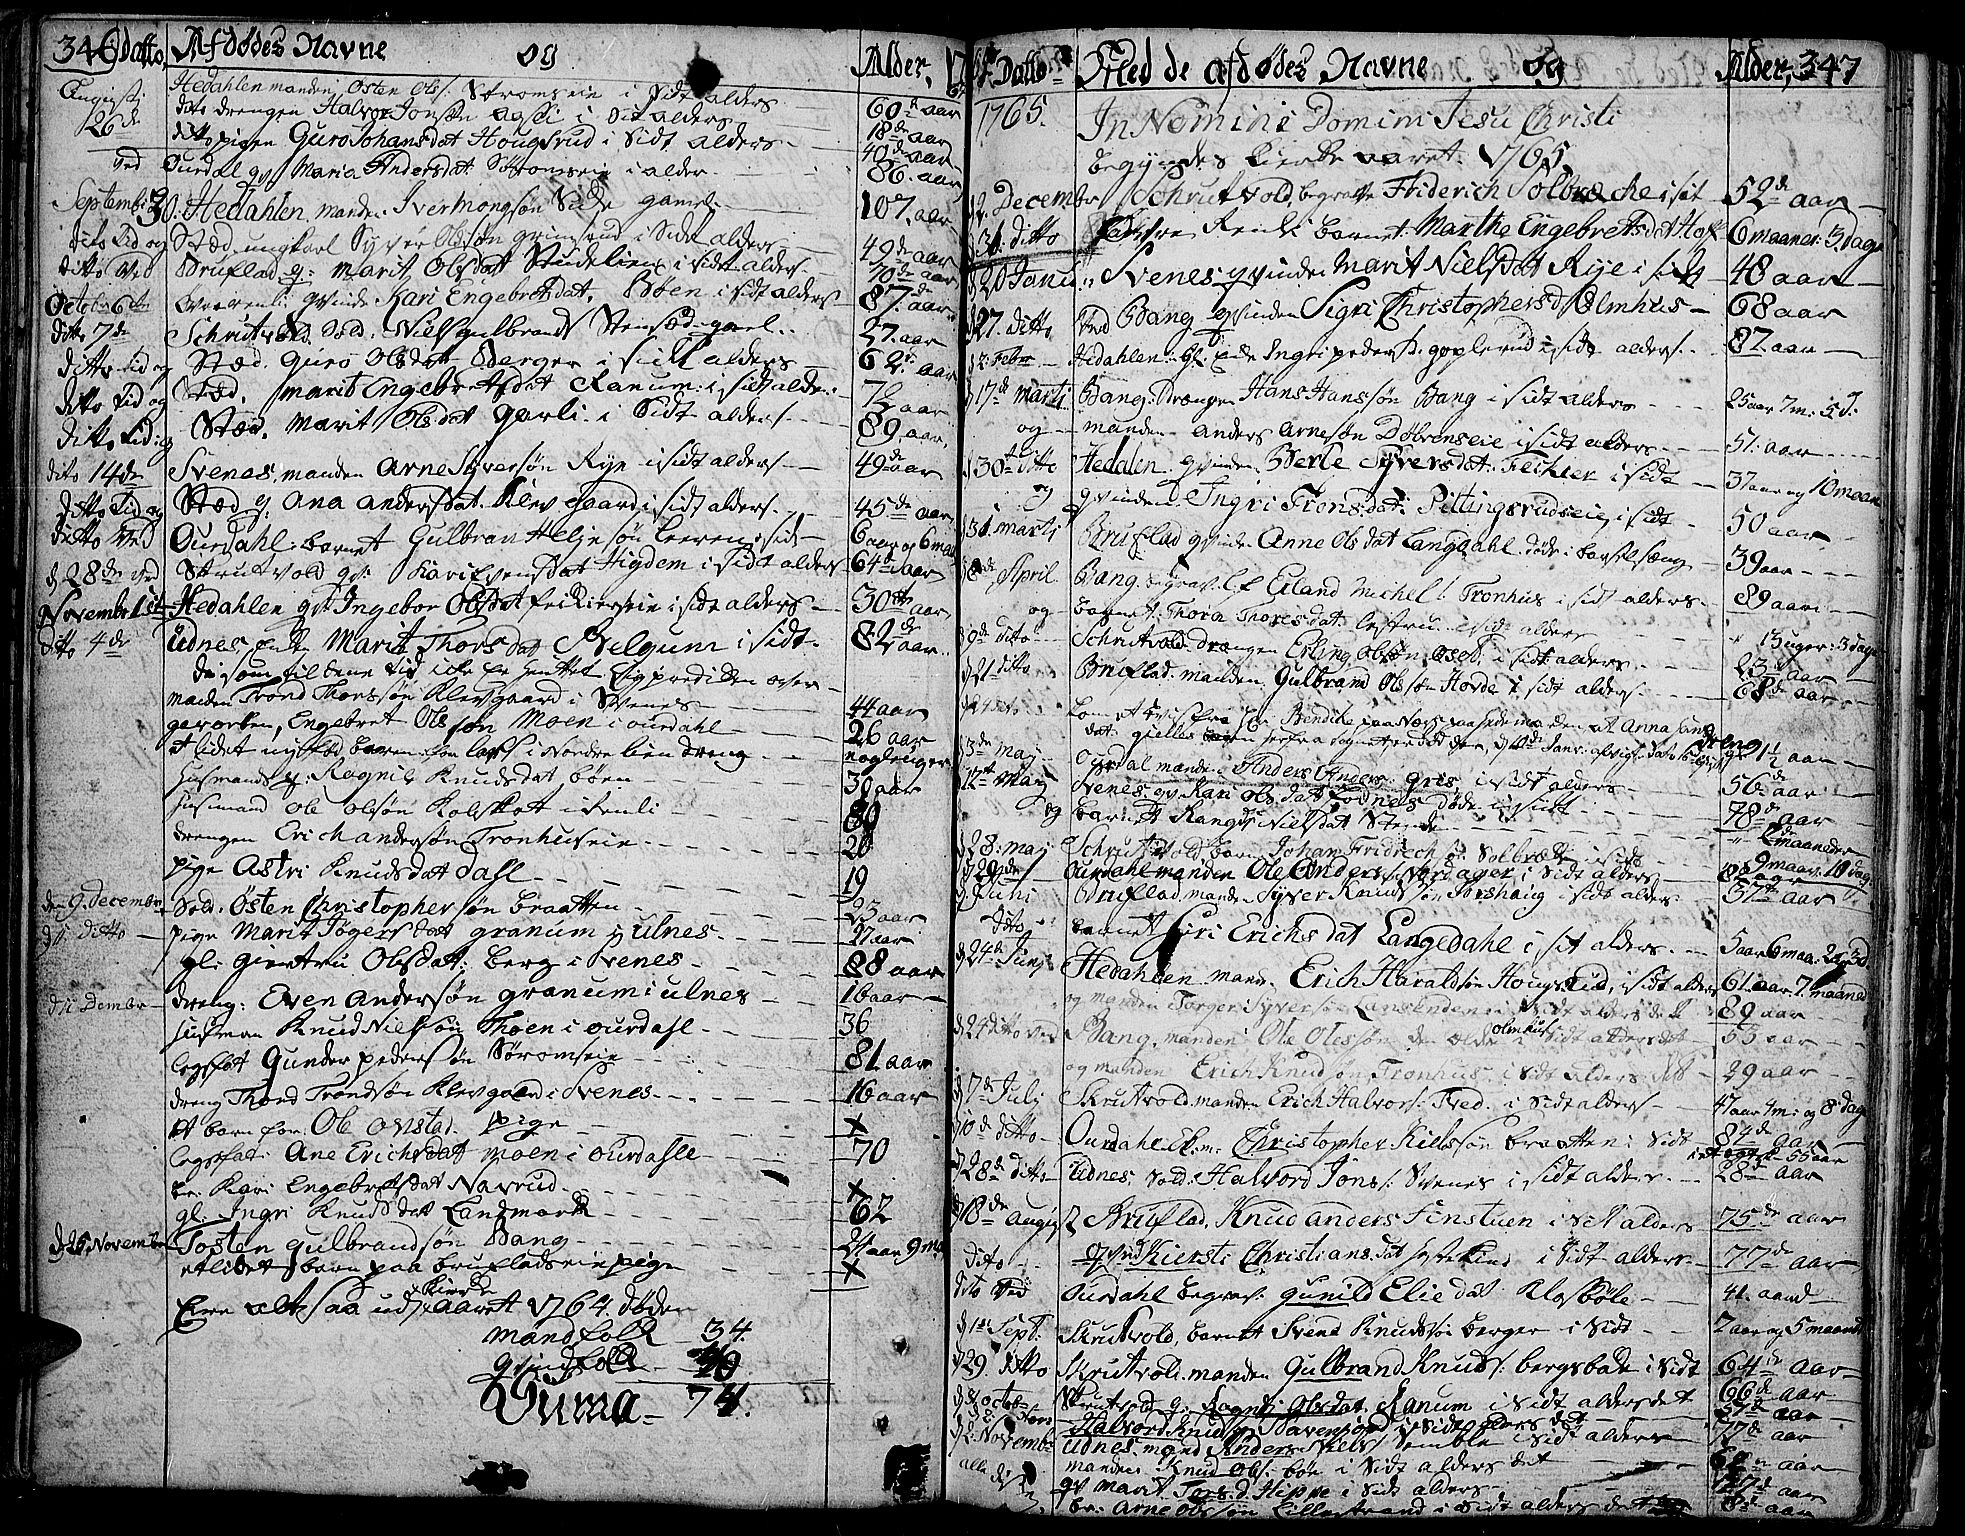 SAH, Aurdal prestekontor, Ministerialbok nr. 5, 1763-1781, s. 346-347